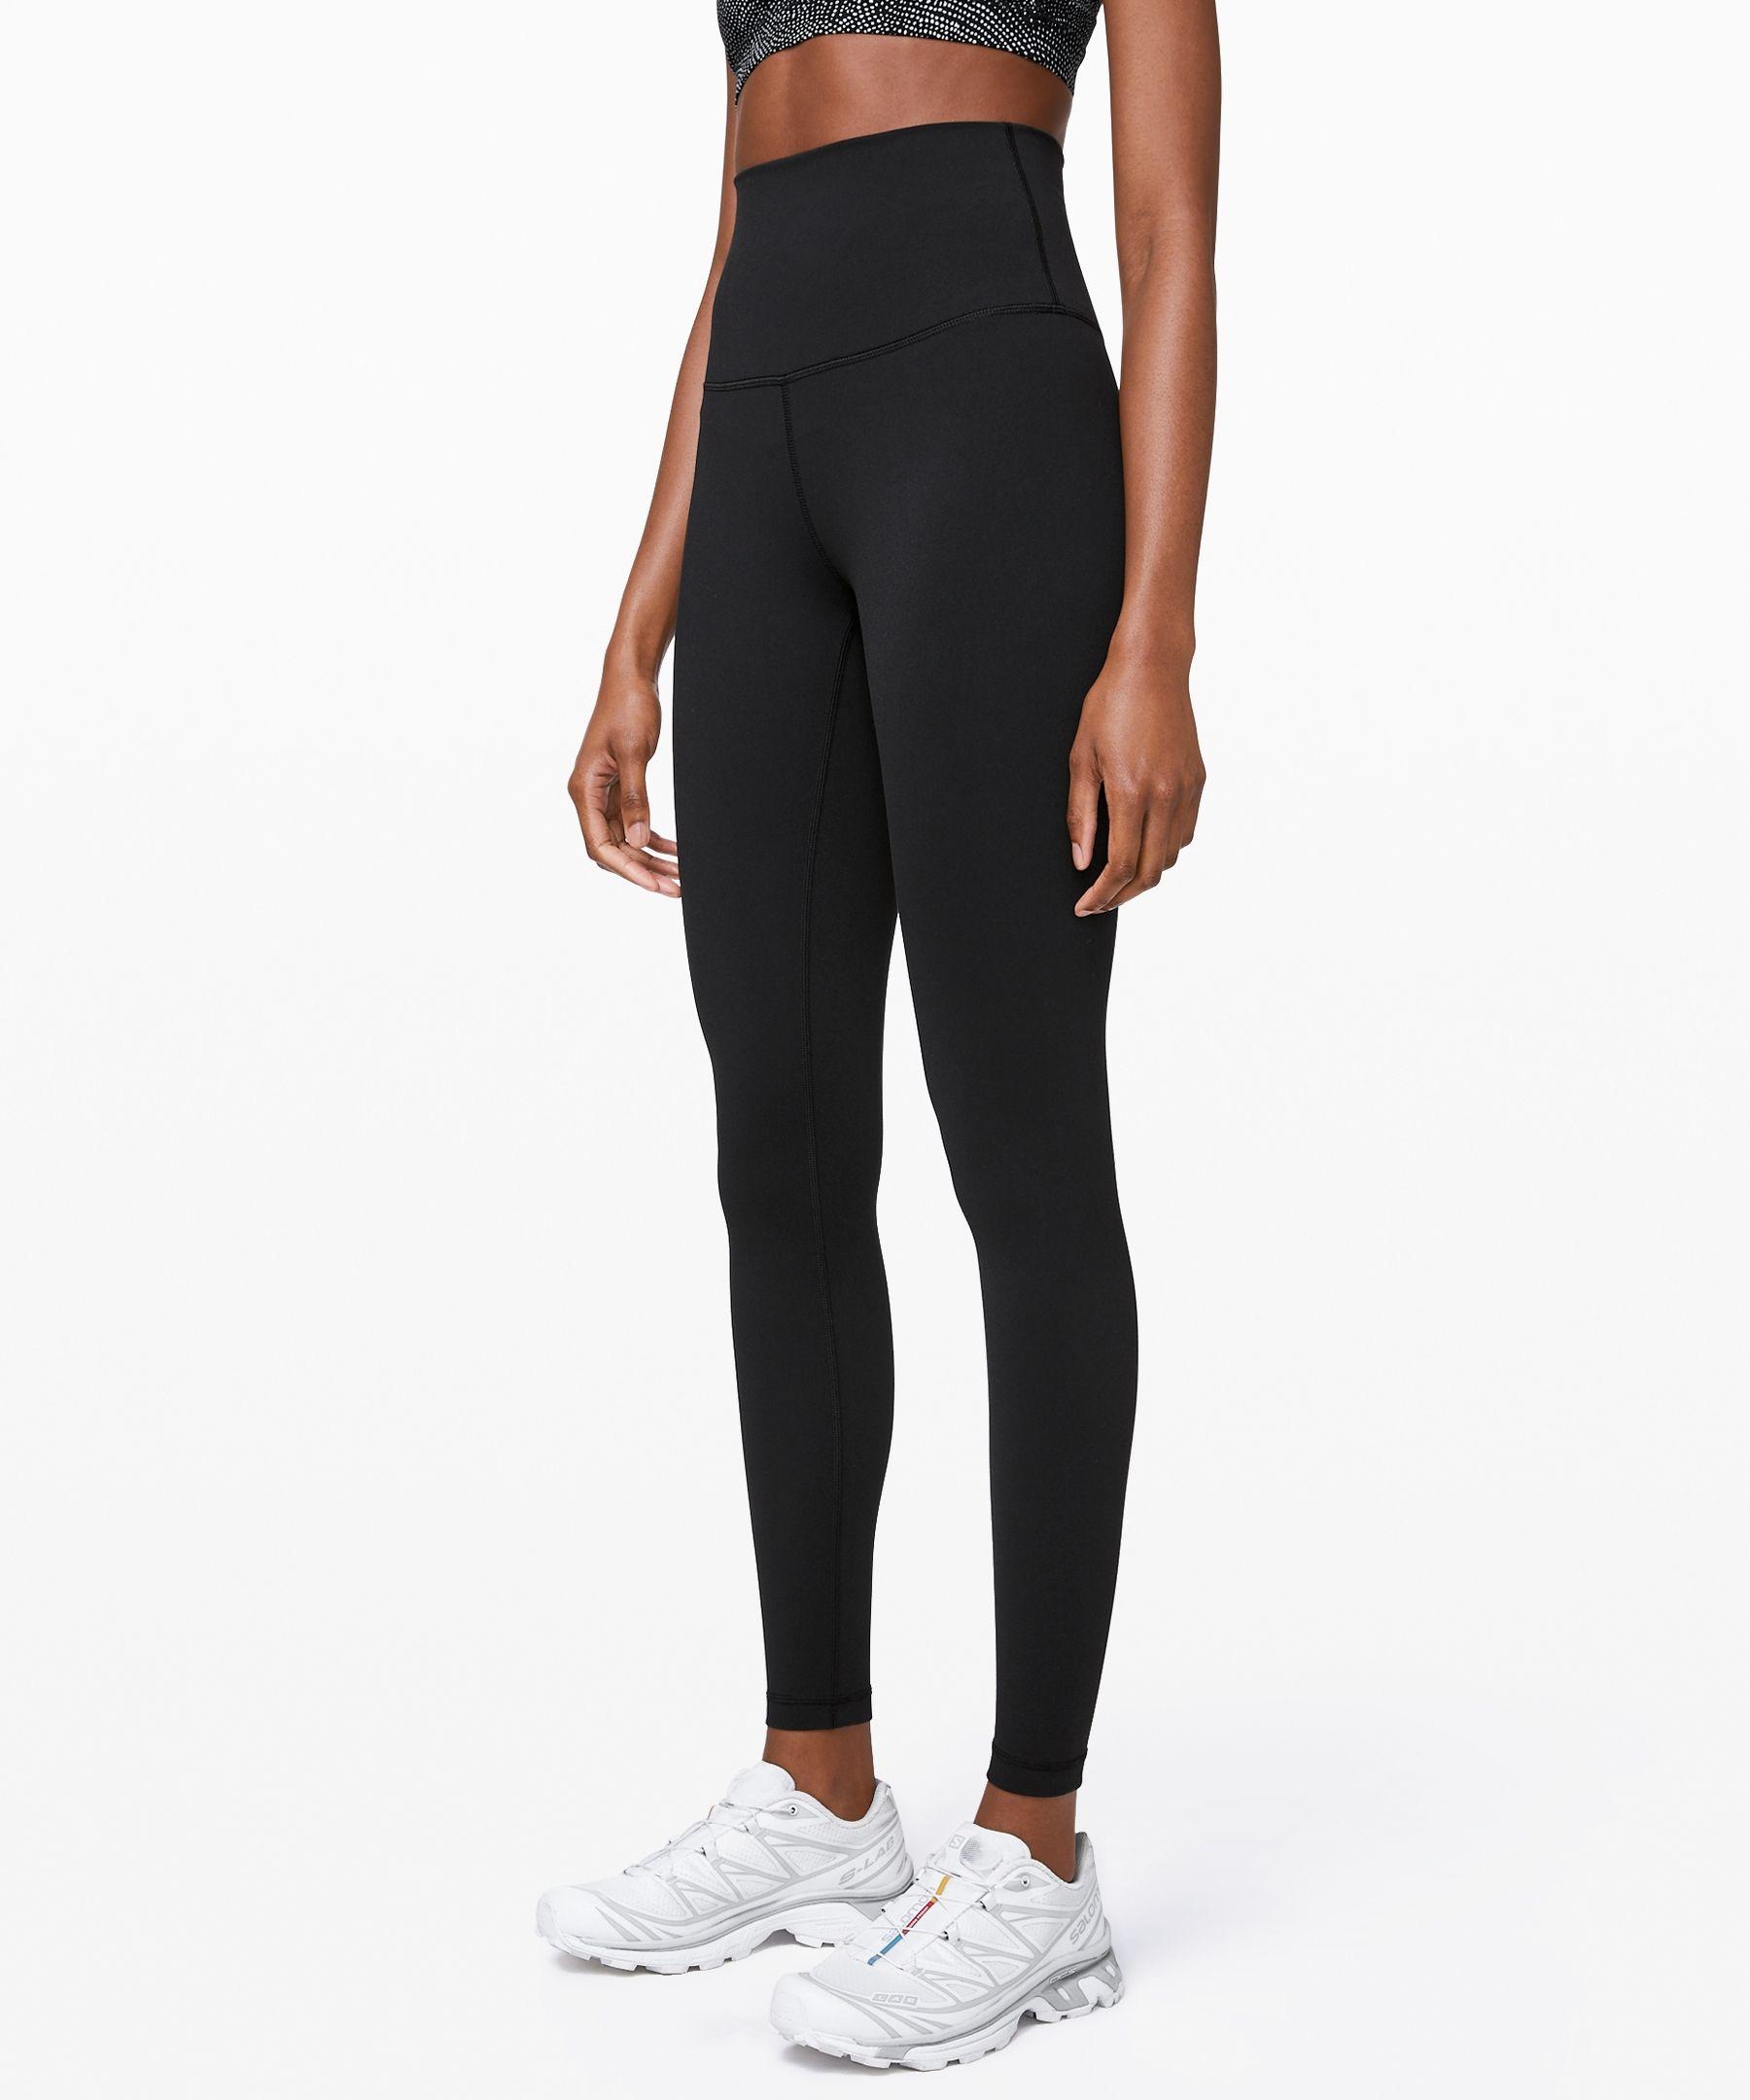 Nike Duffle bag (Medium), Sports, Sports Apparel on Carousell